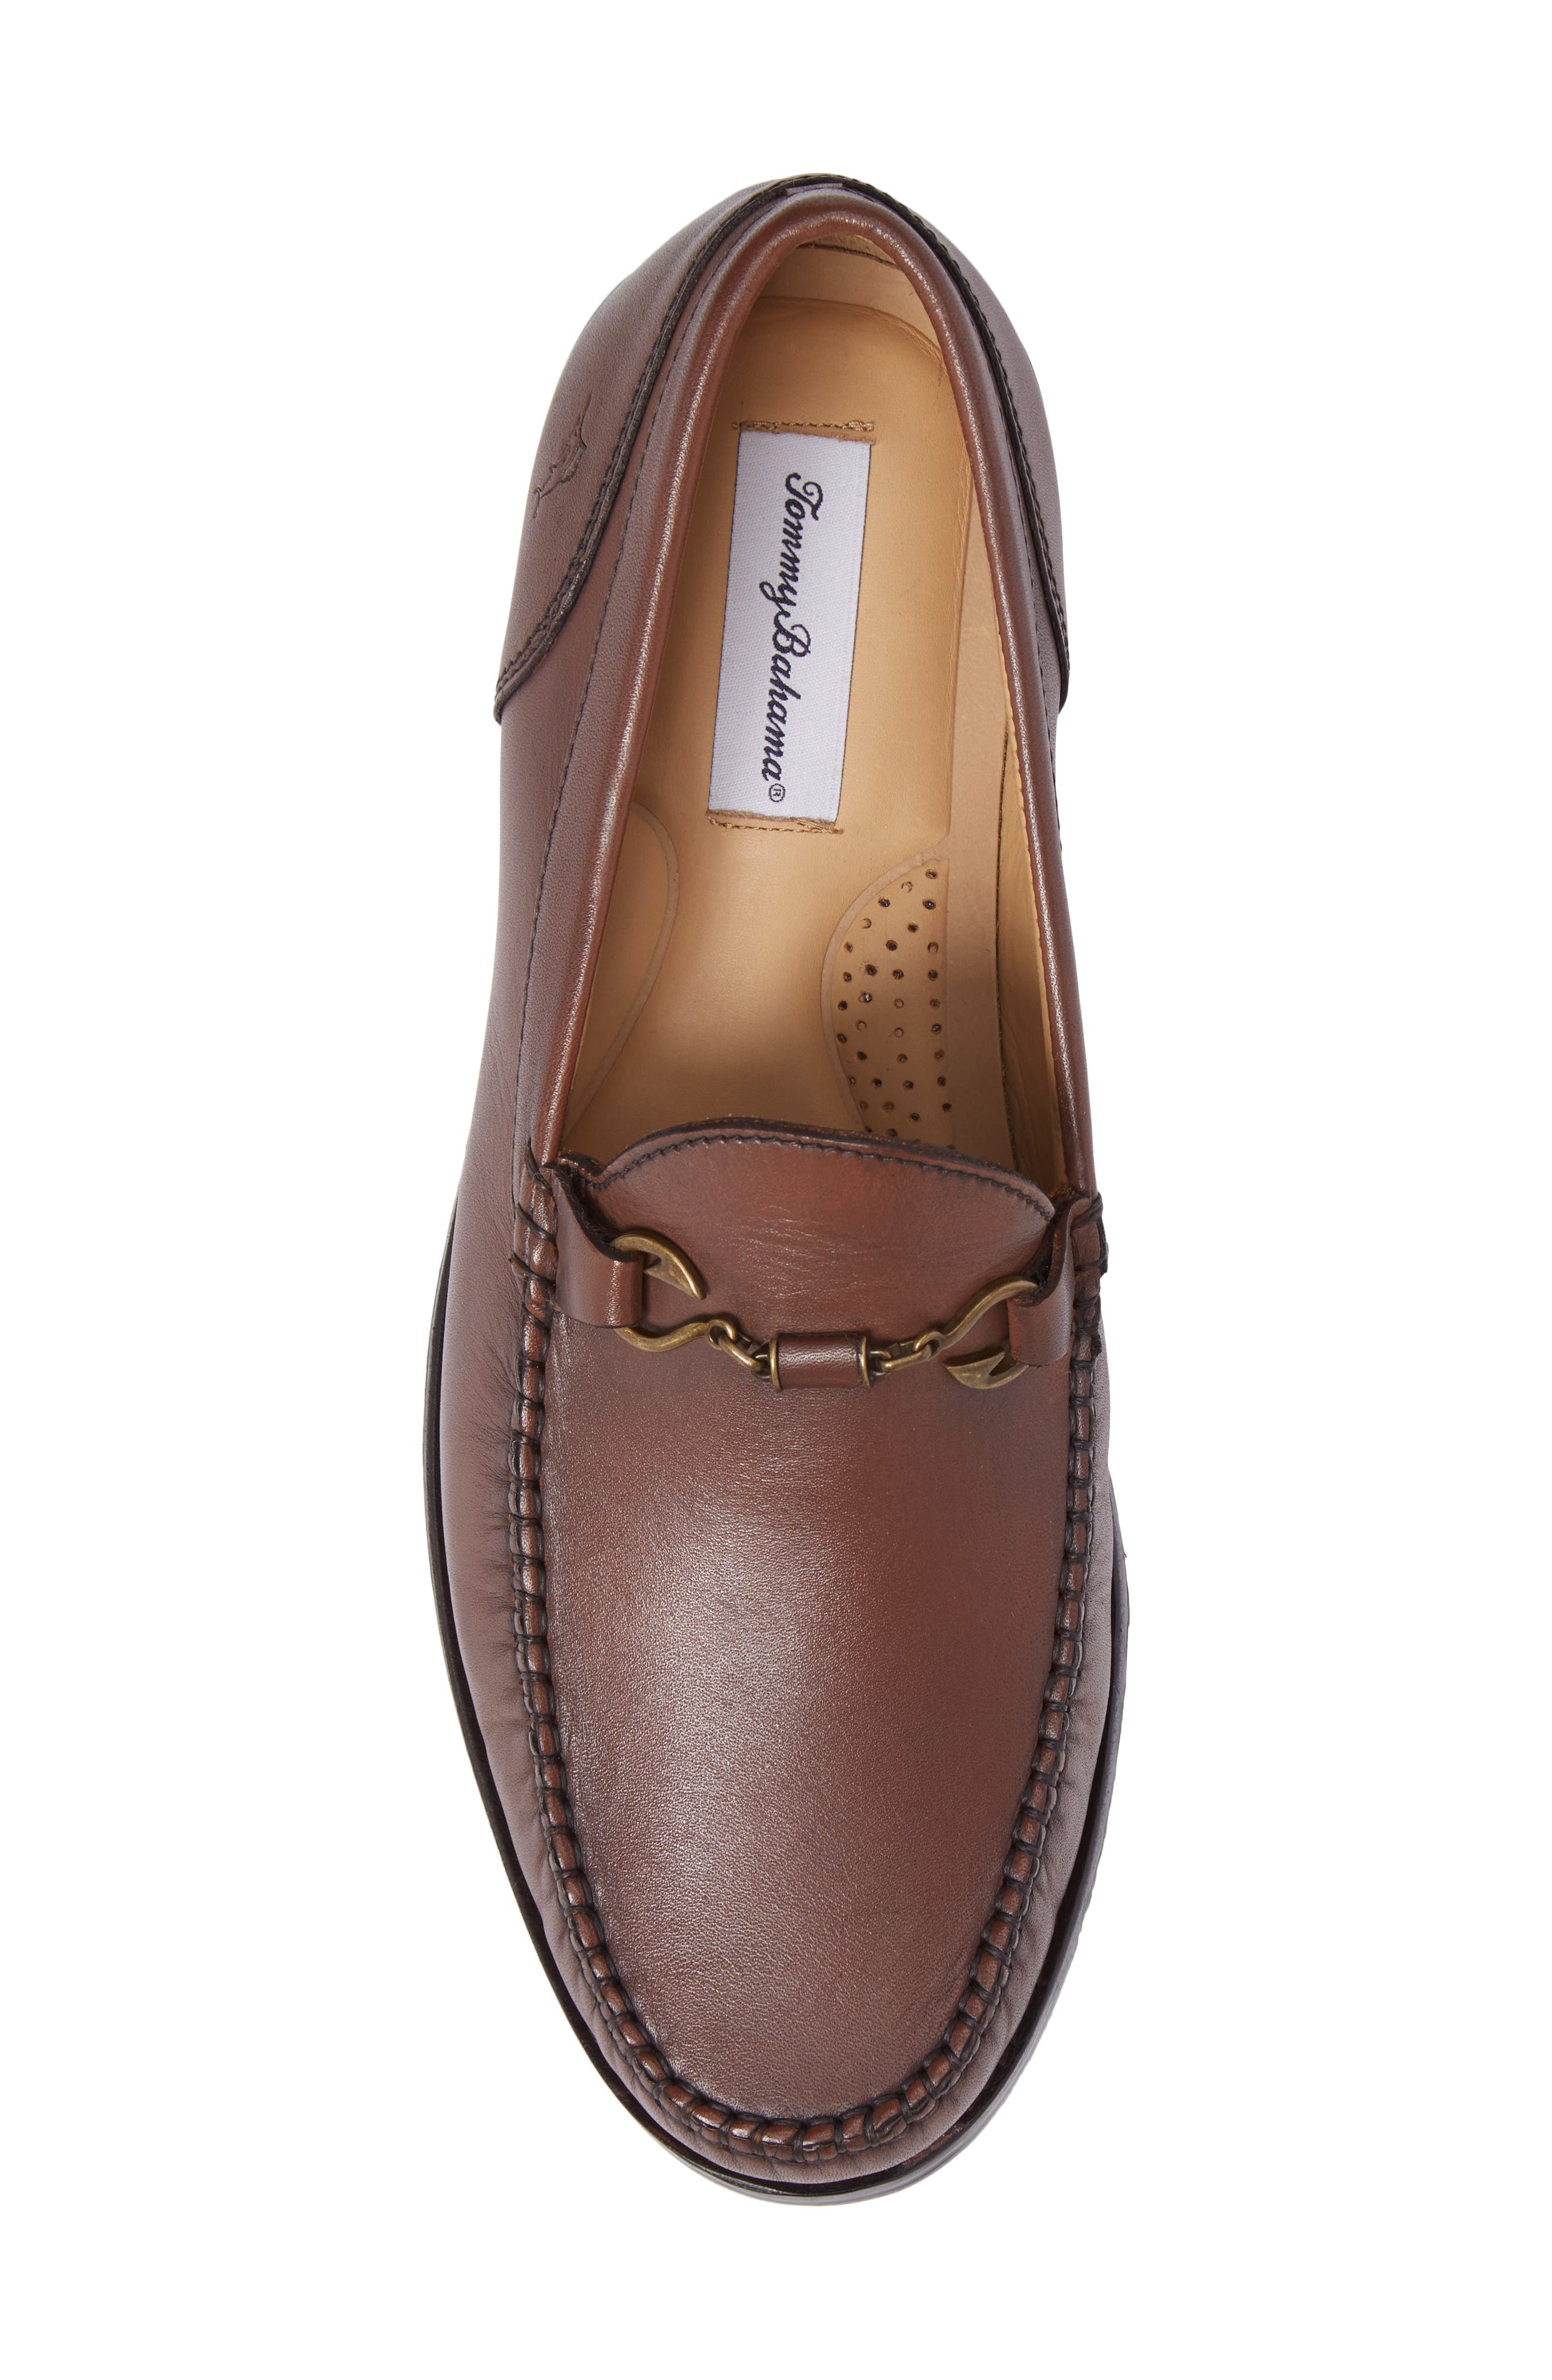 Maya Bay Bit Loafer,                             Alternate thumbnail 5, color,                             Brown Leather